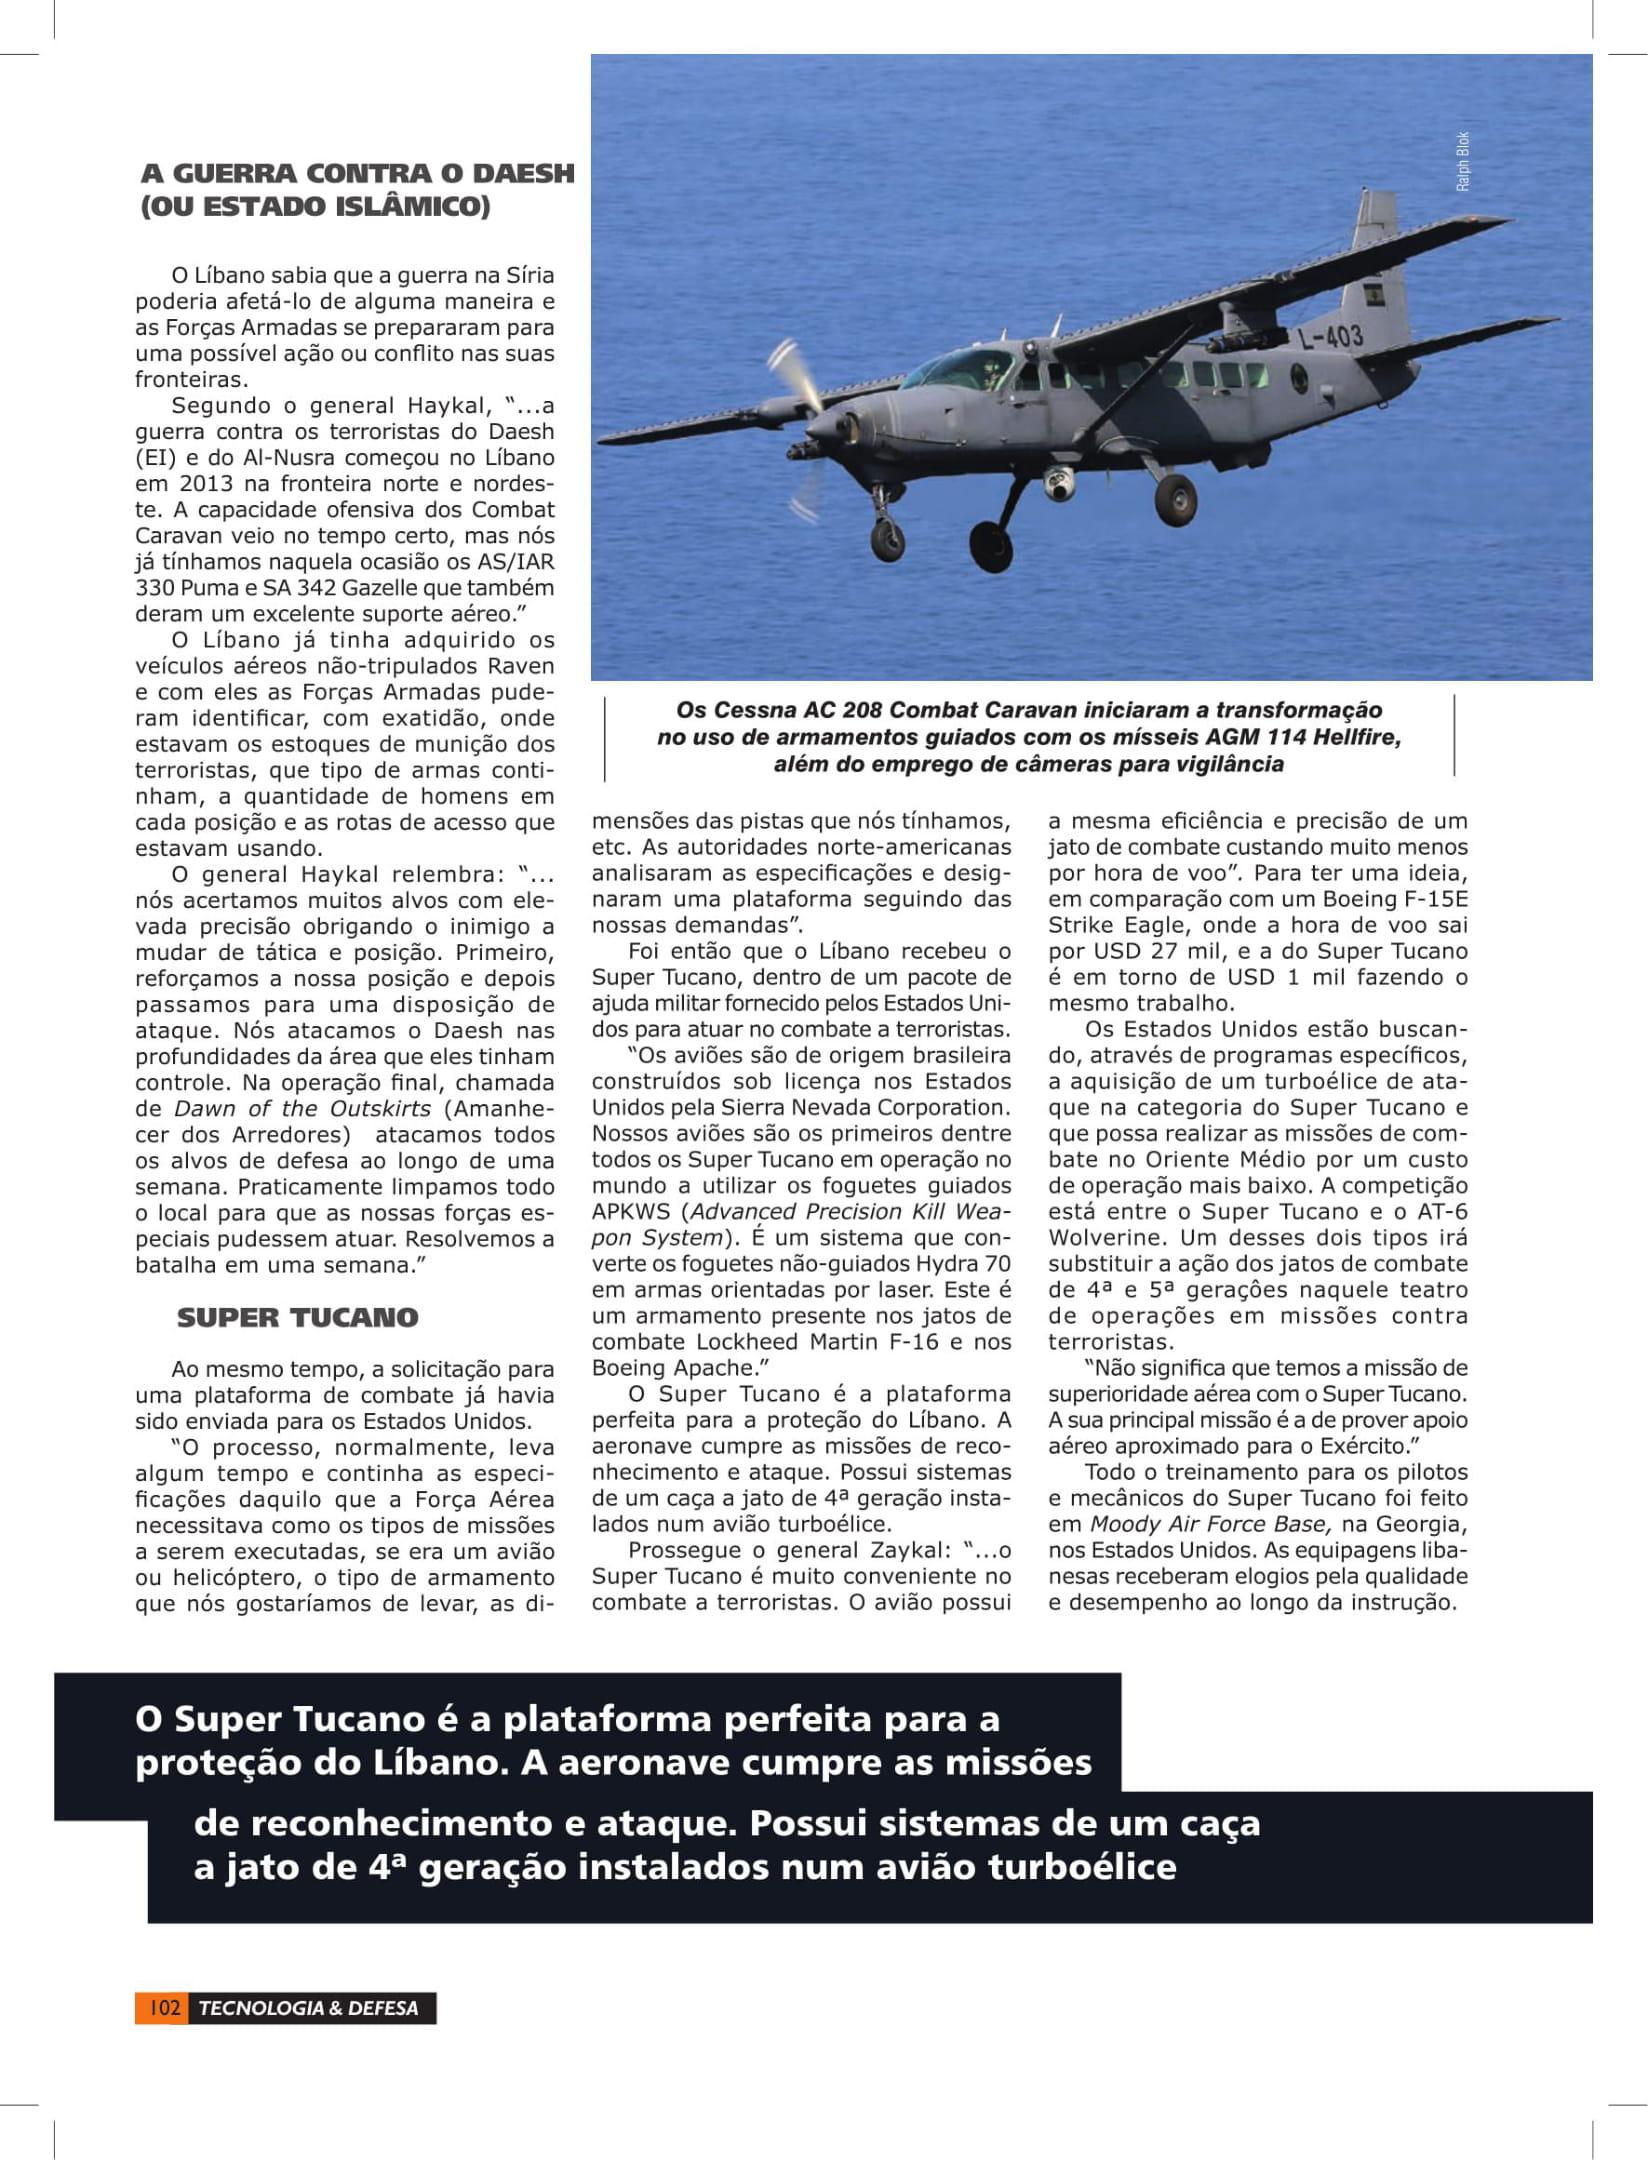 Tecnologia & Defesa (Brazil)_Lebanese Air Force-6